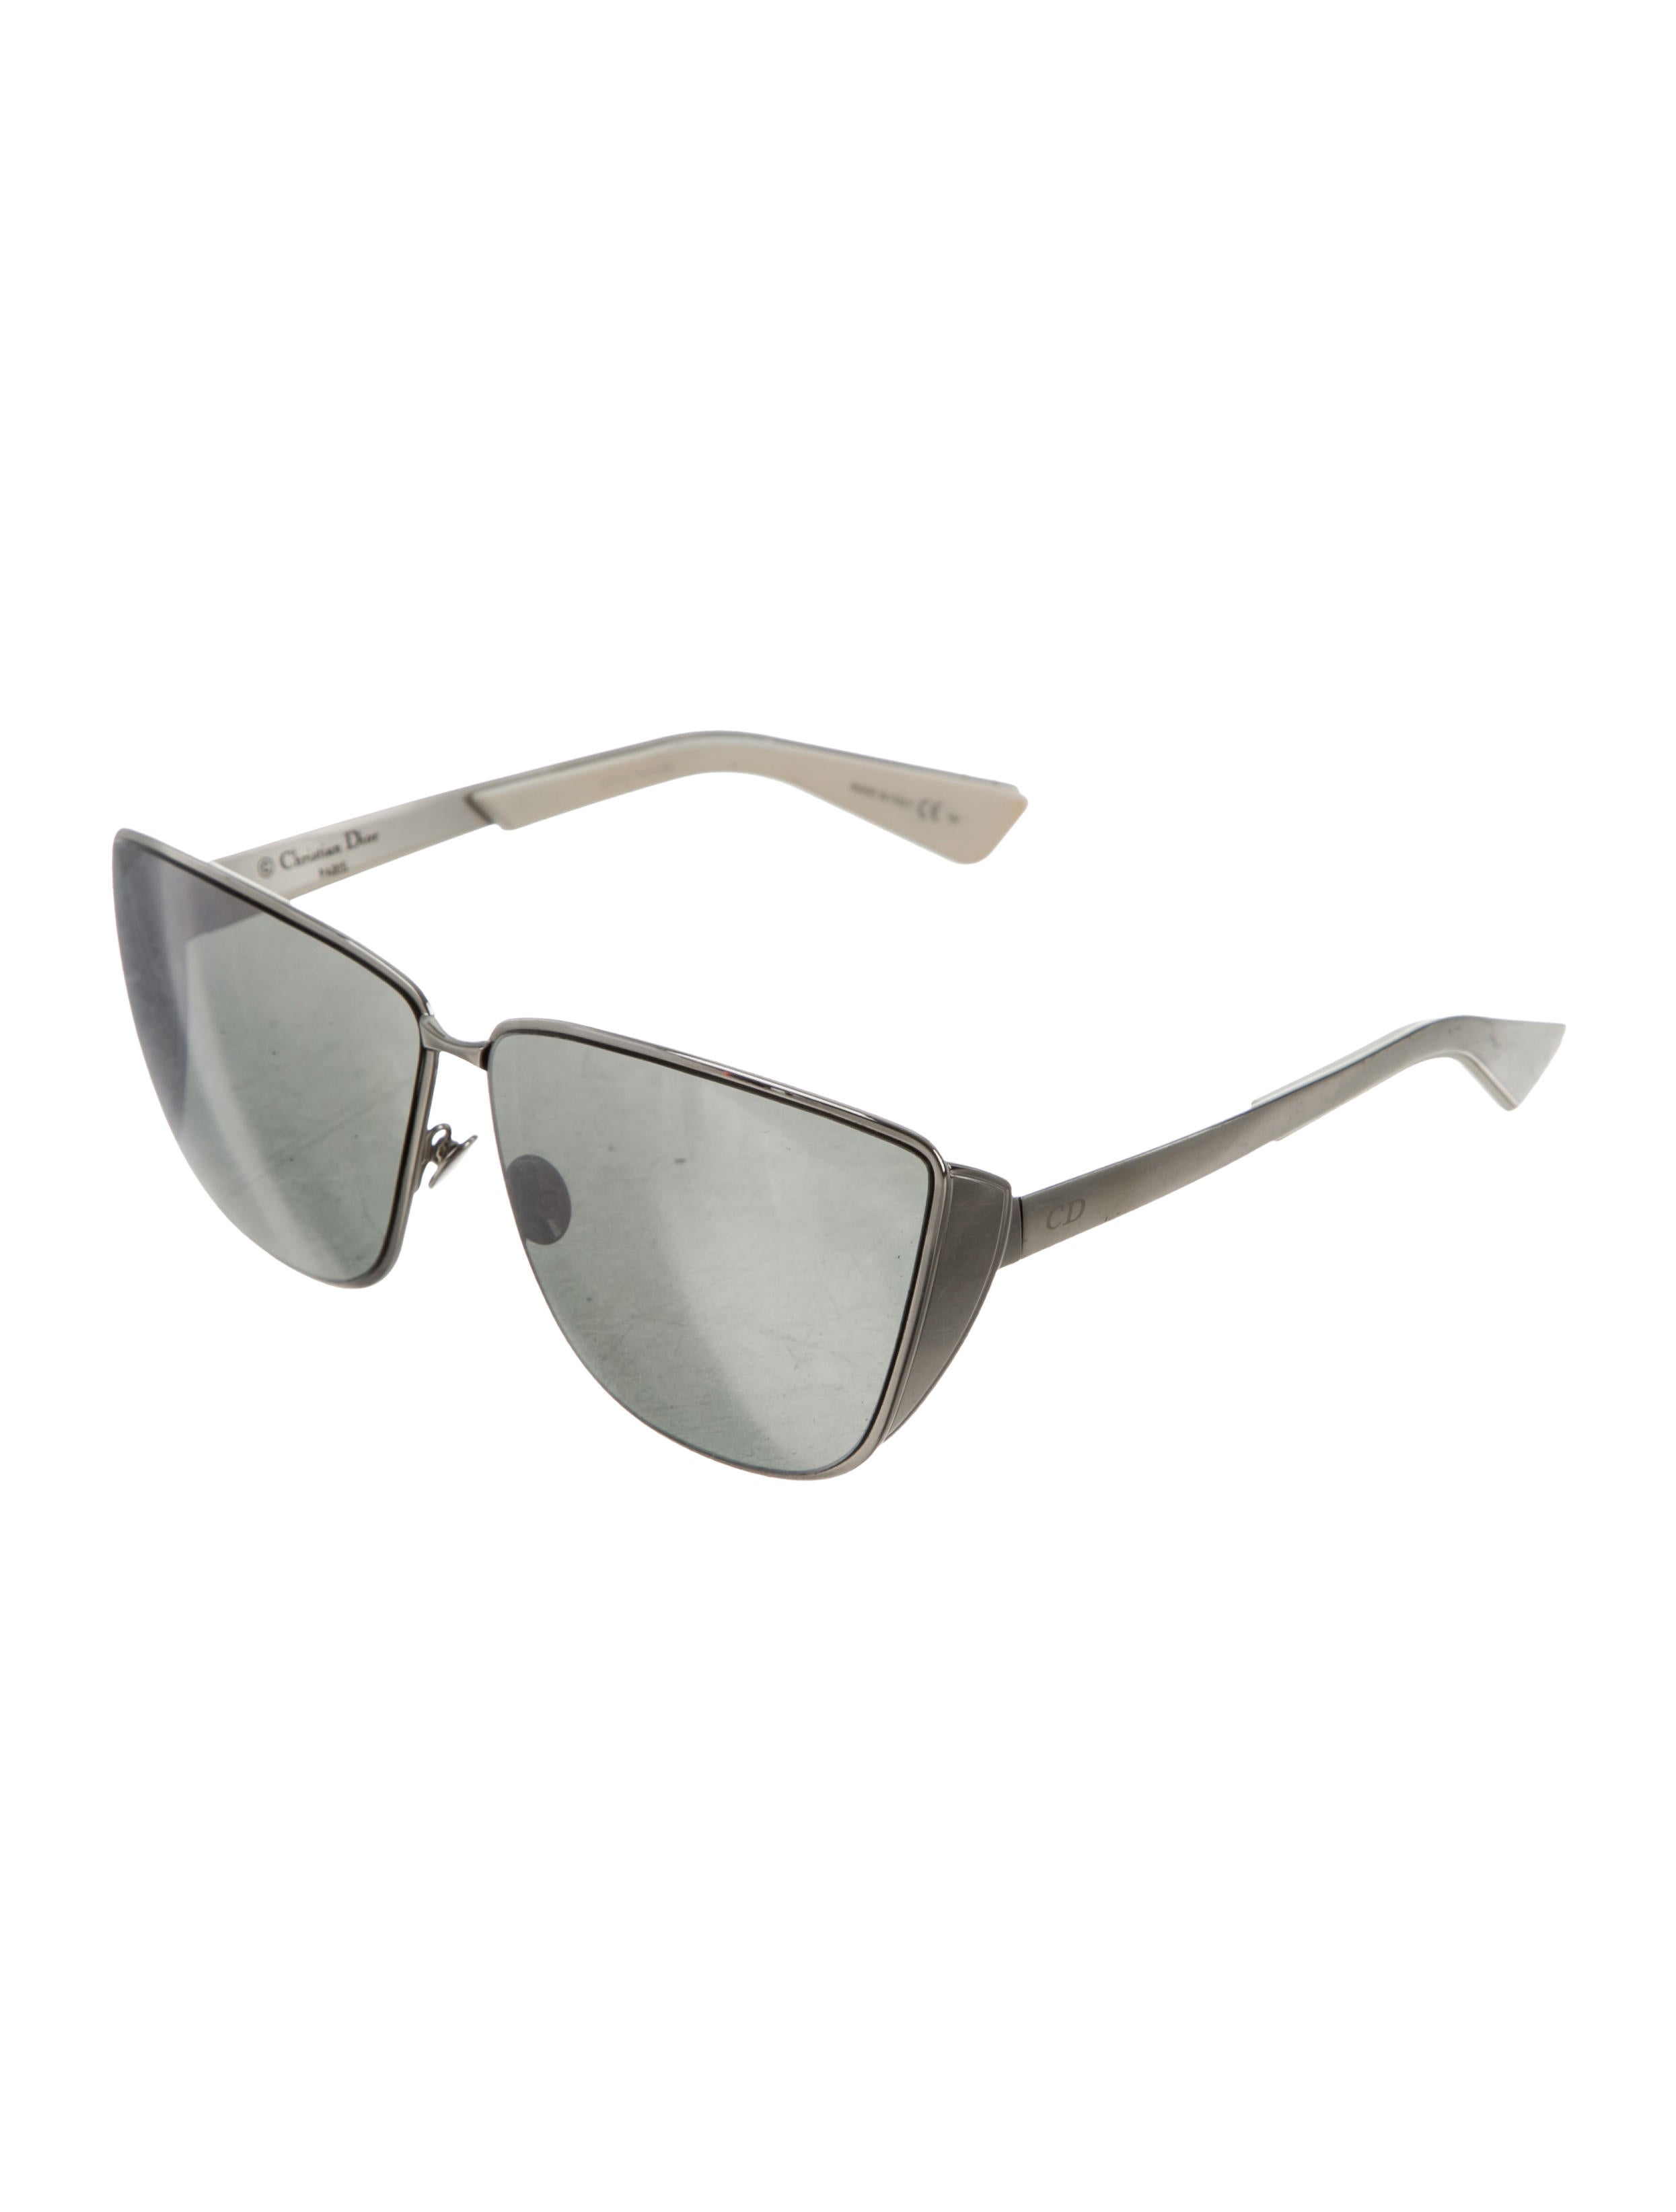 20853c2bccb Dior Mirror Sunglasses - Bitterroot Public Library